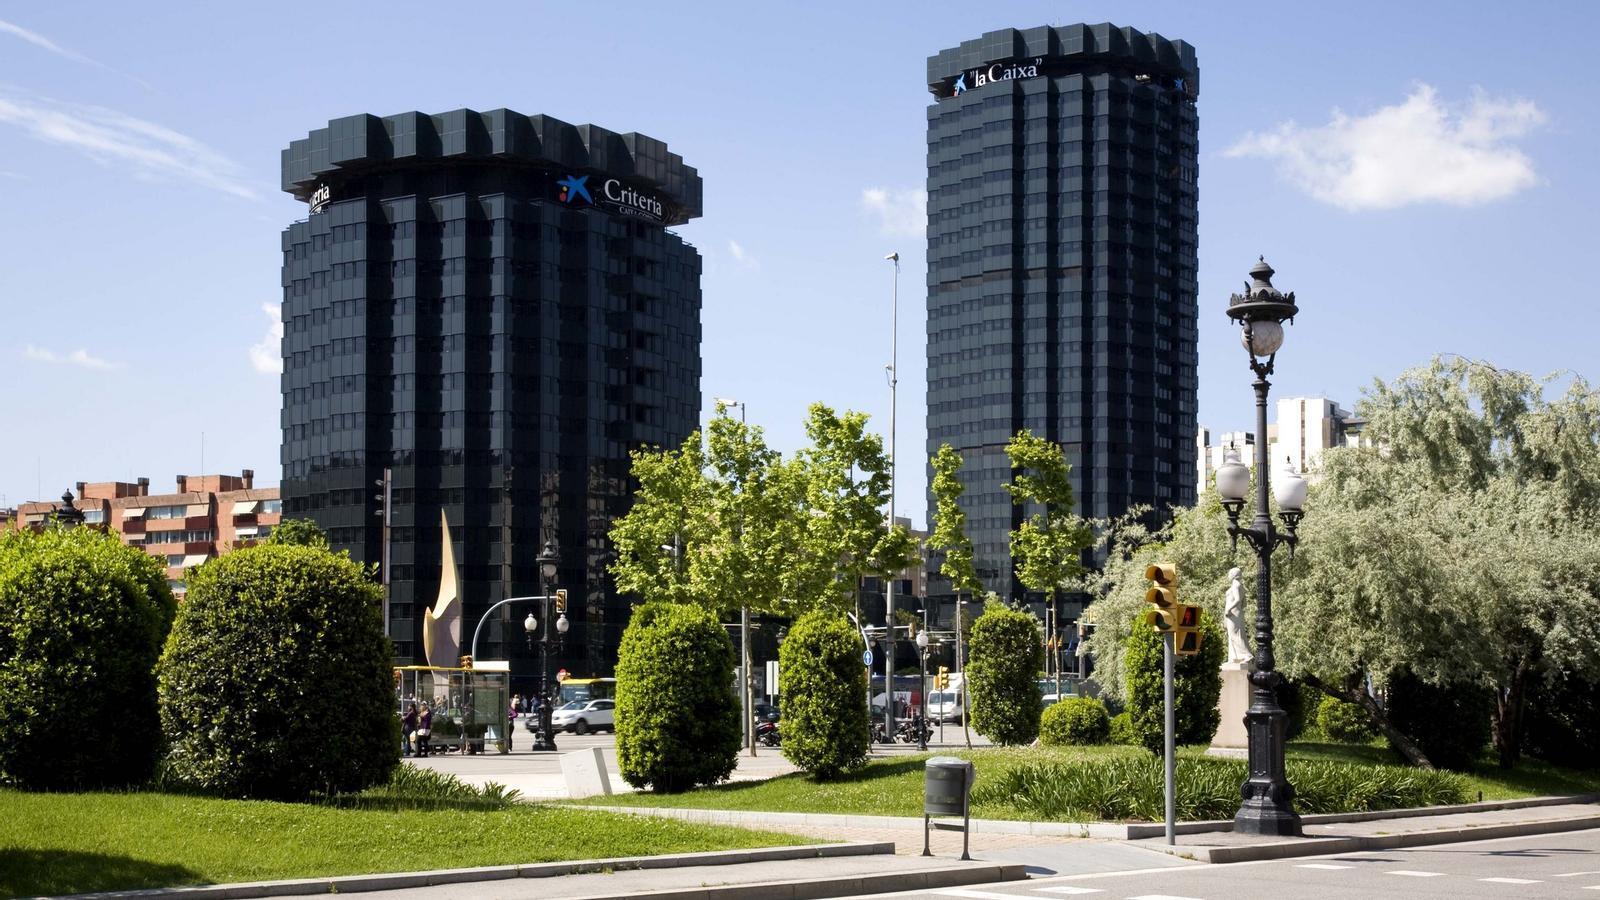 Oficines centrals de La Caixa, a Barcelona